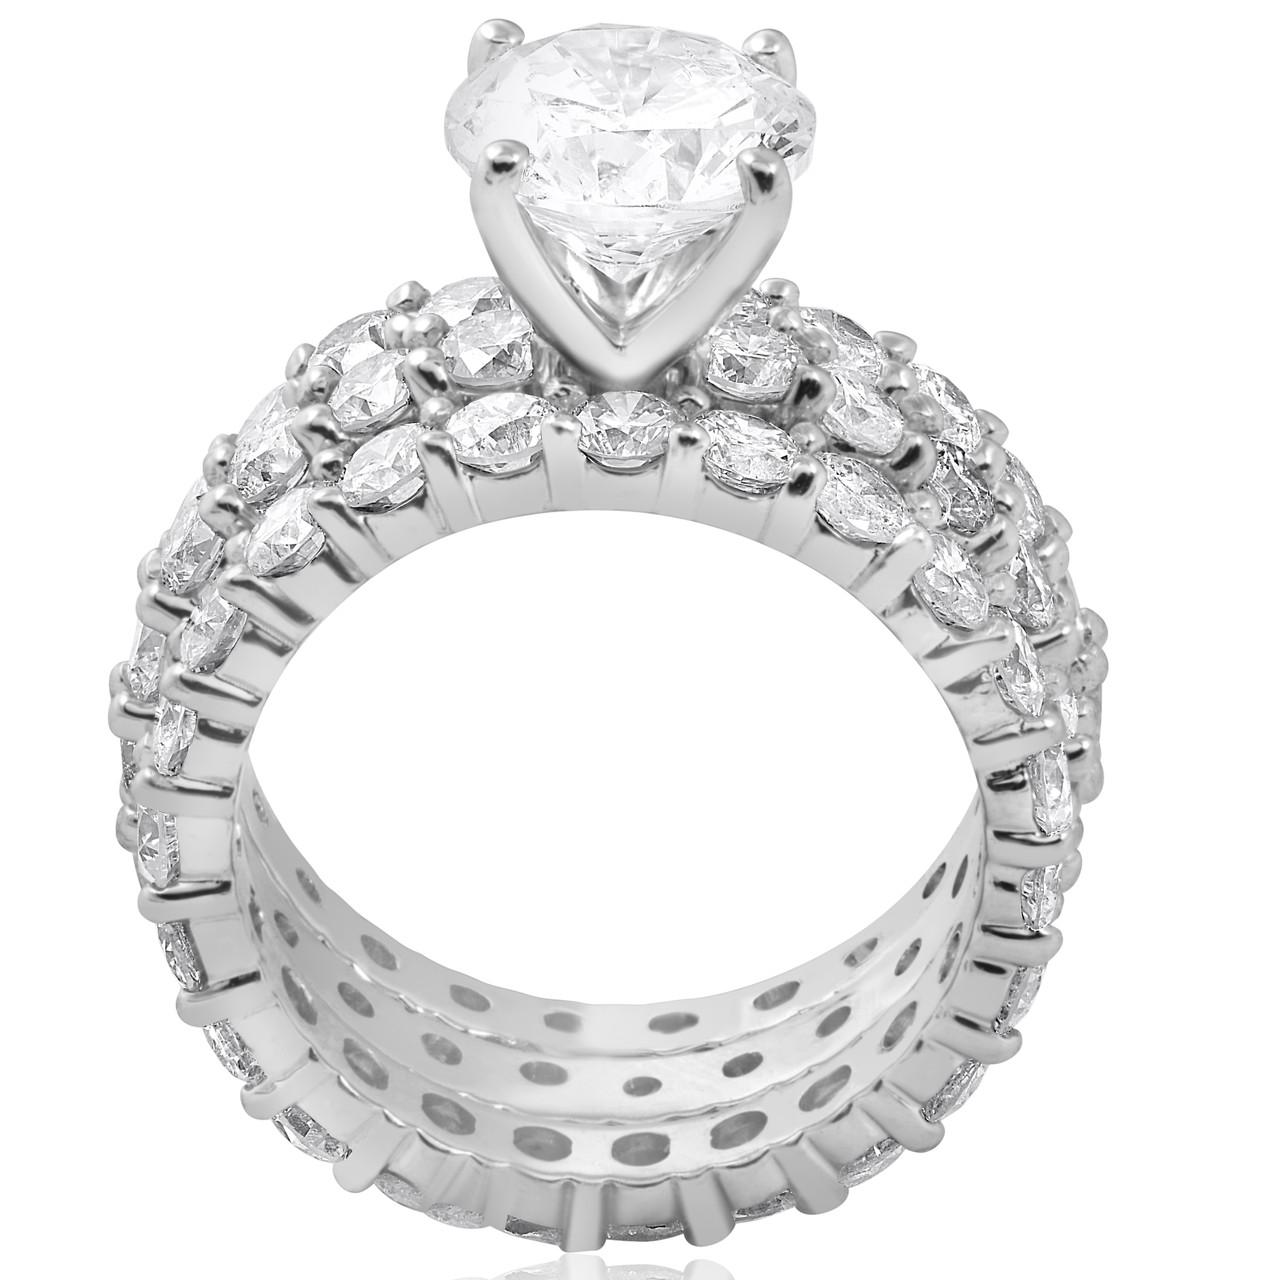 7ct Diamond Engagement Eternity Wedding Ring Set 14k White Gold